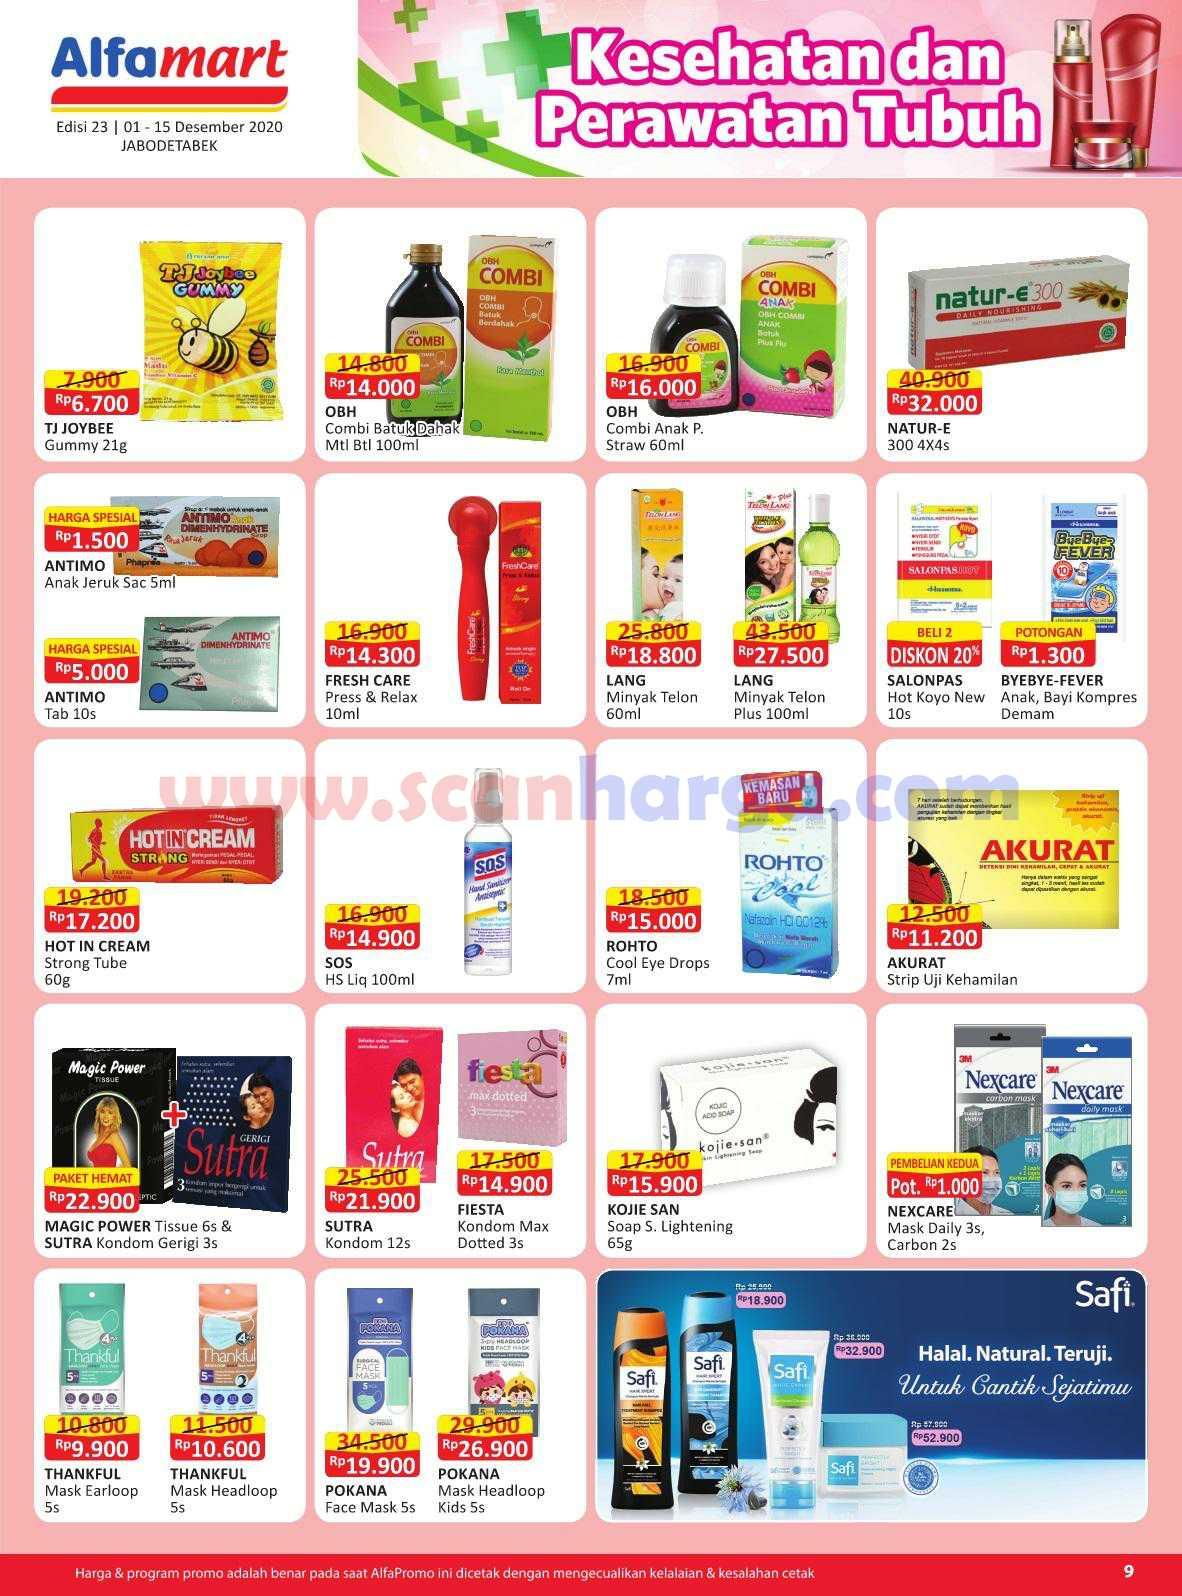 Katalog Promo Alfamart 1 - 15 Desember 2020 9